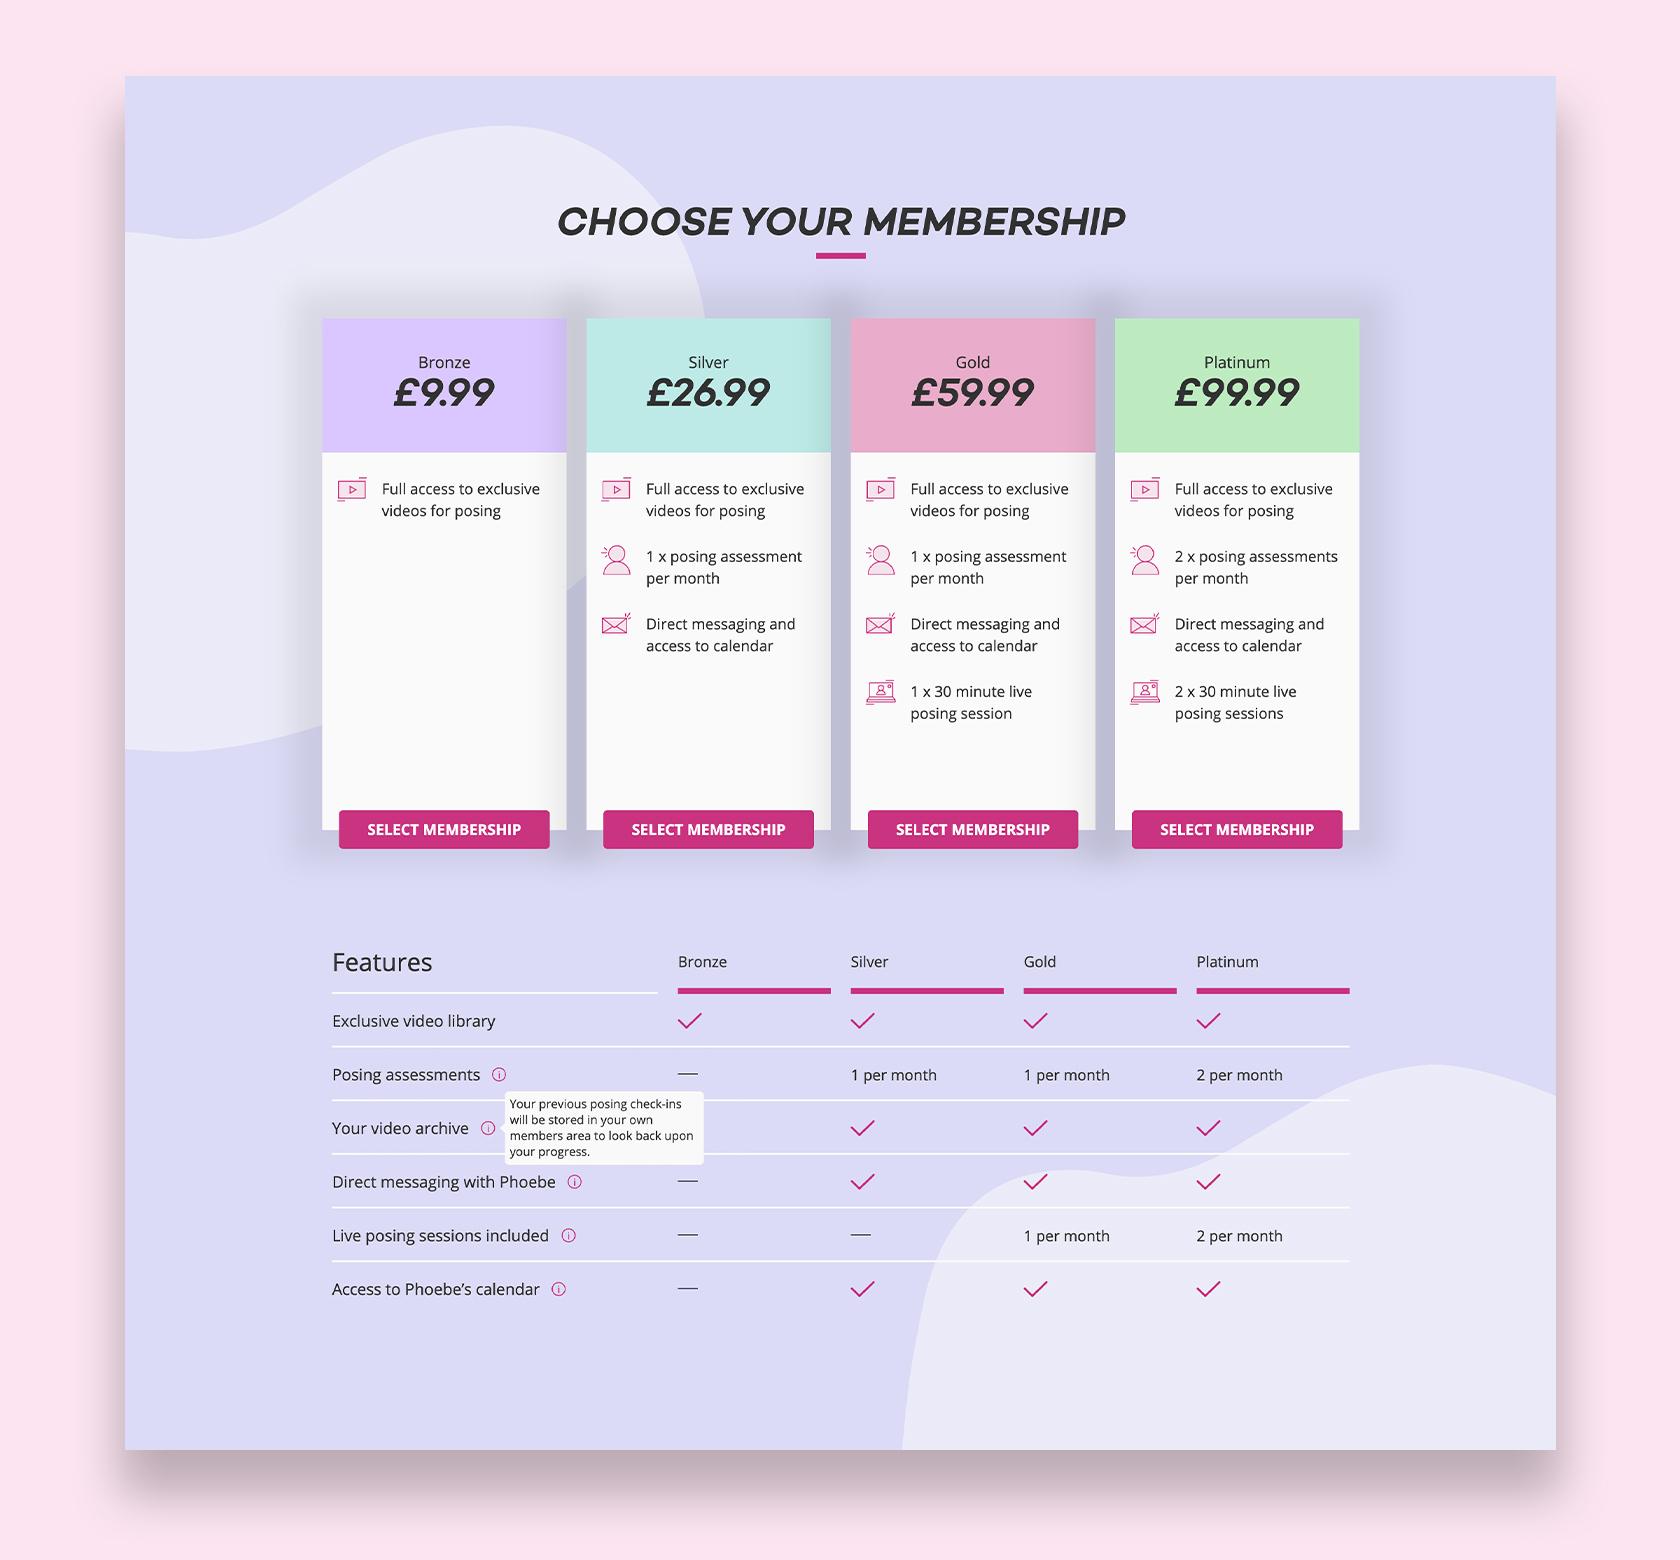 Website visual showing various membership options